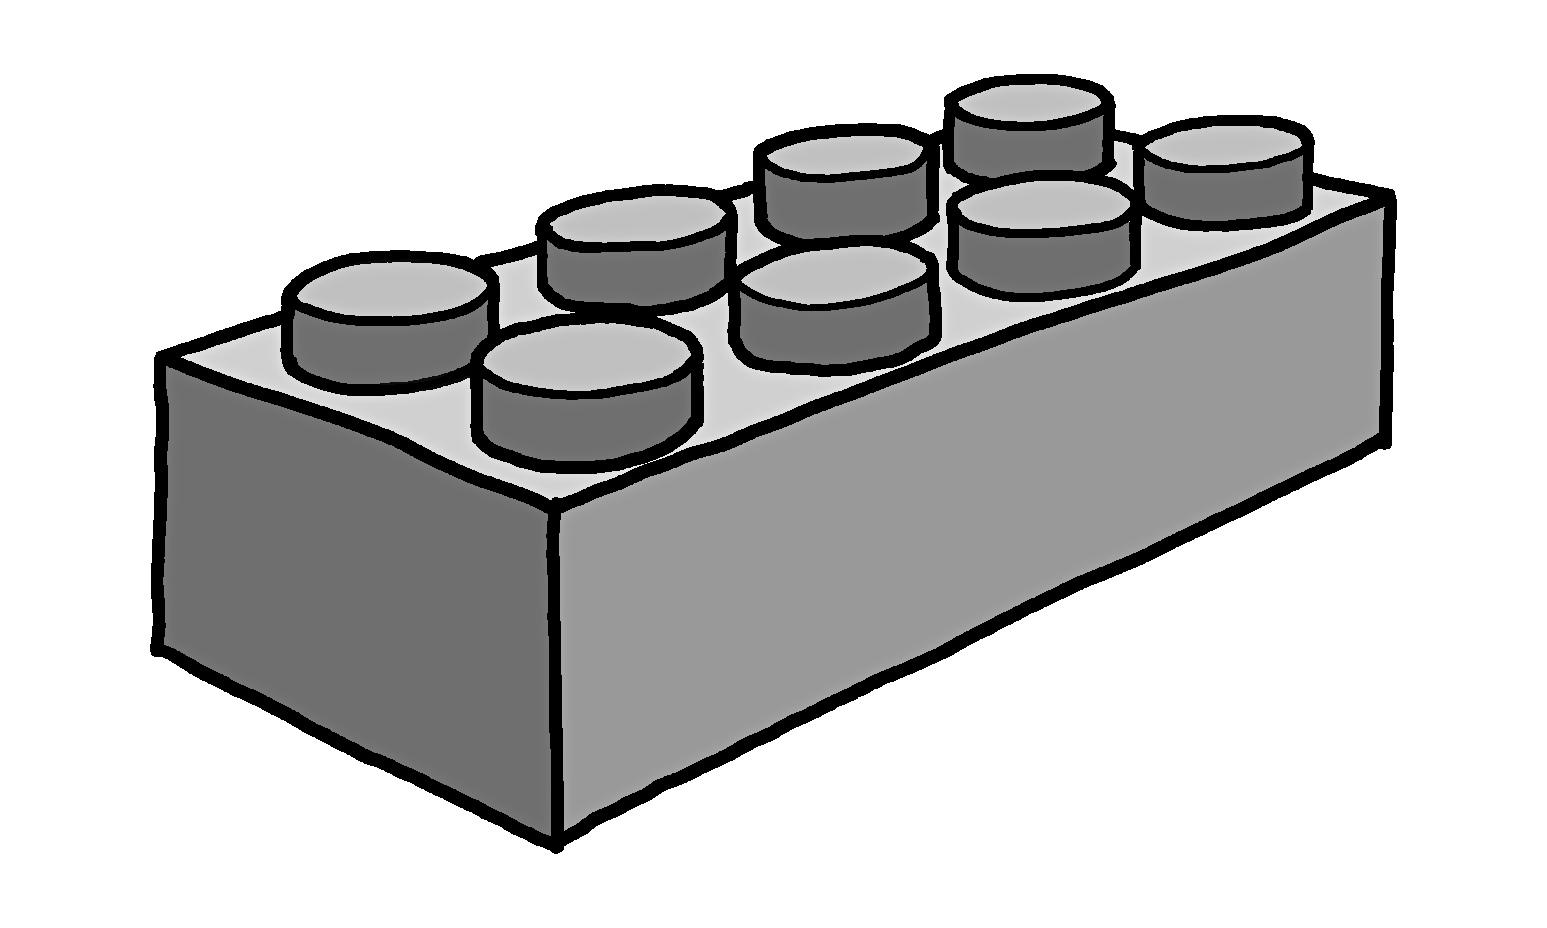 Brick Building Drawing